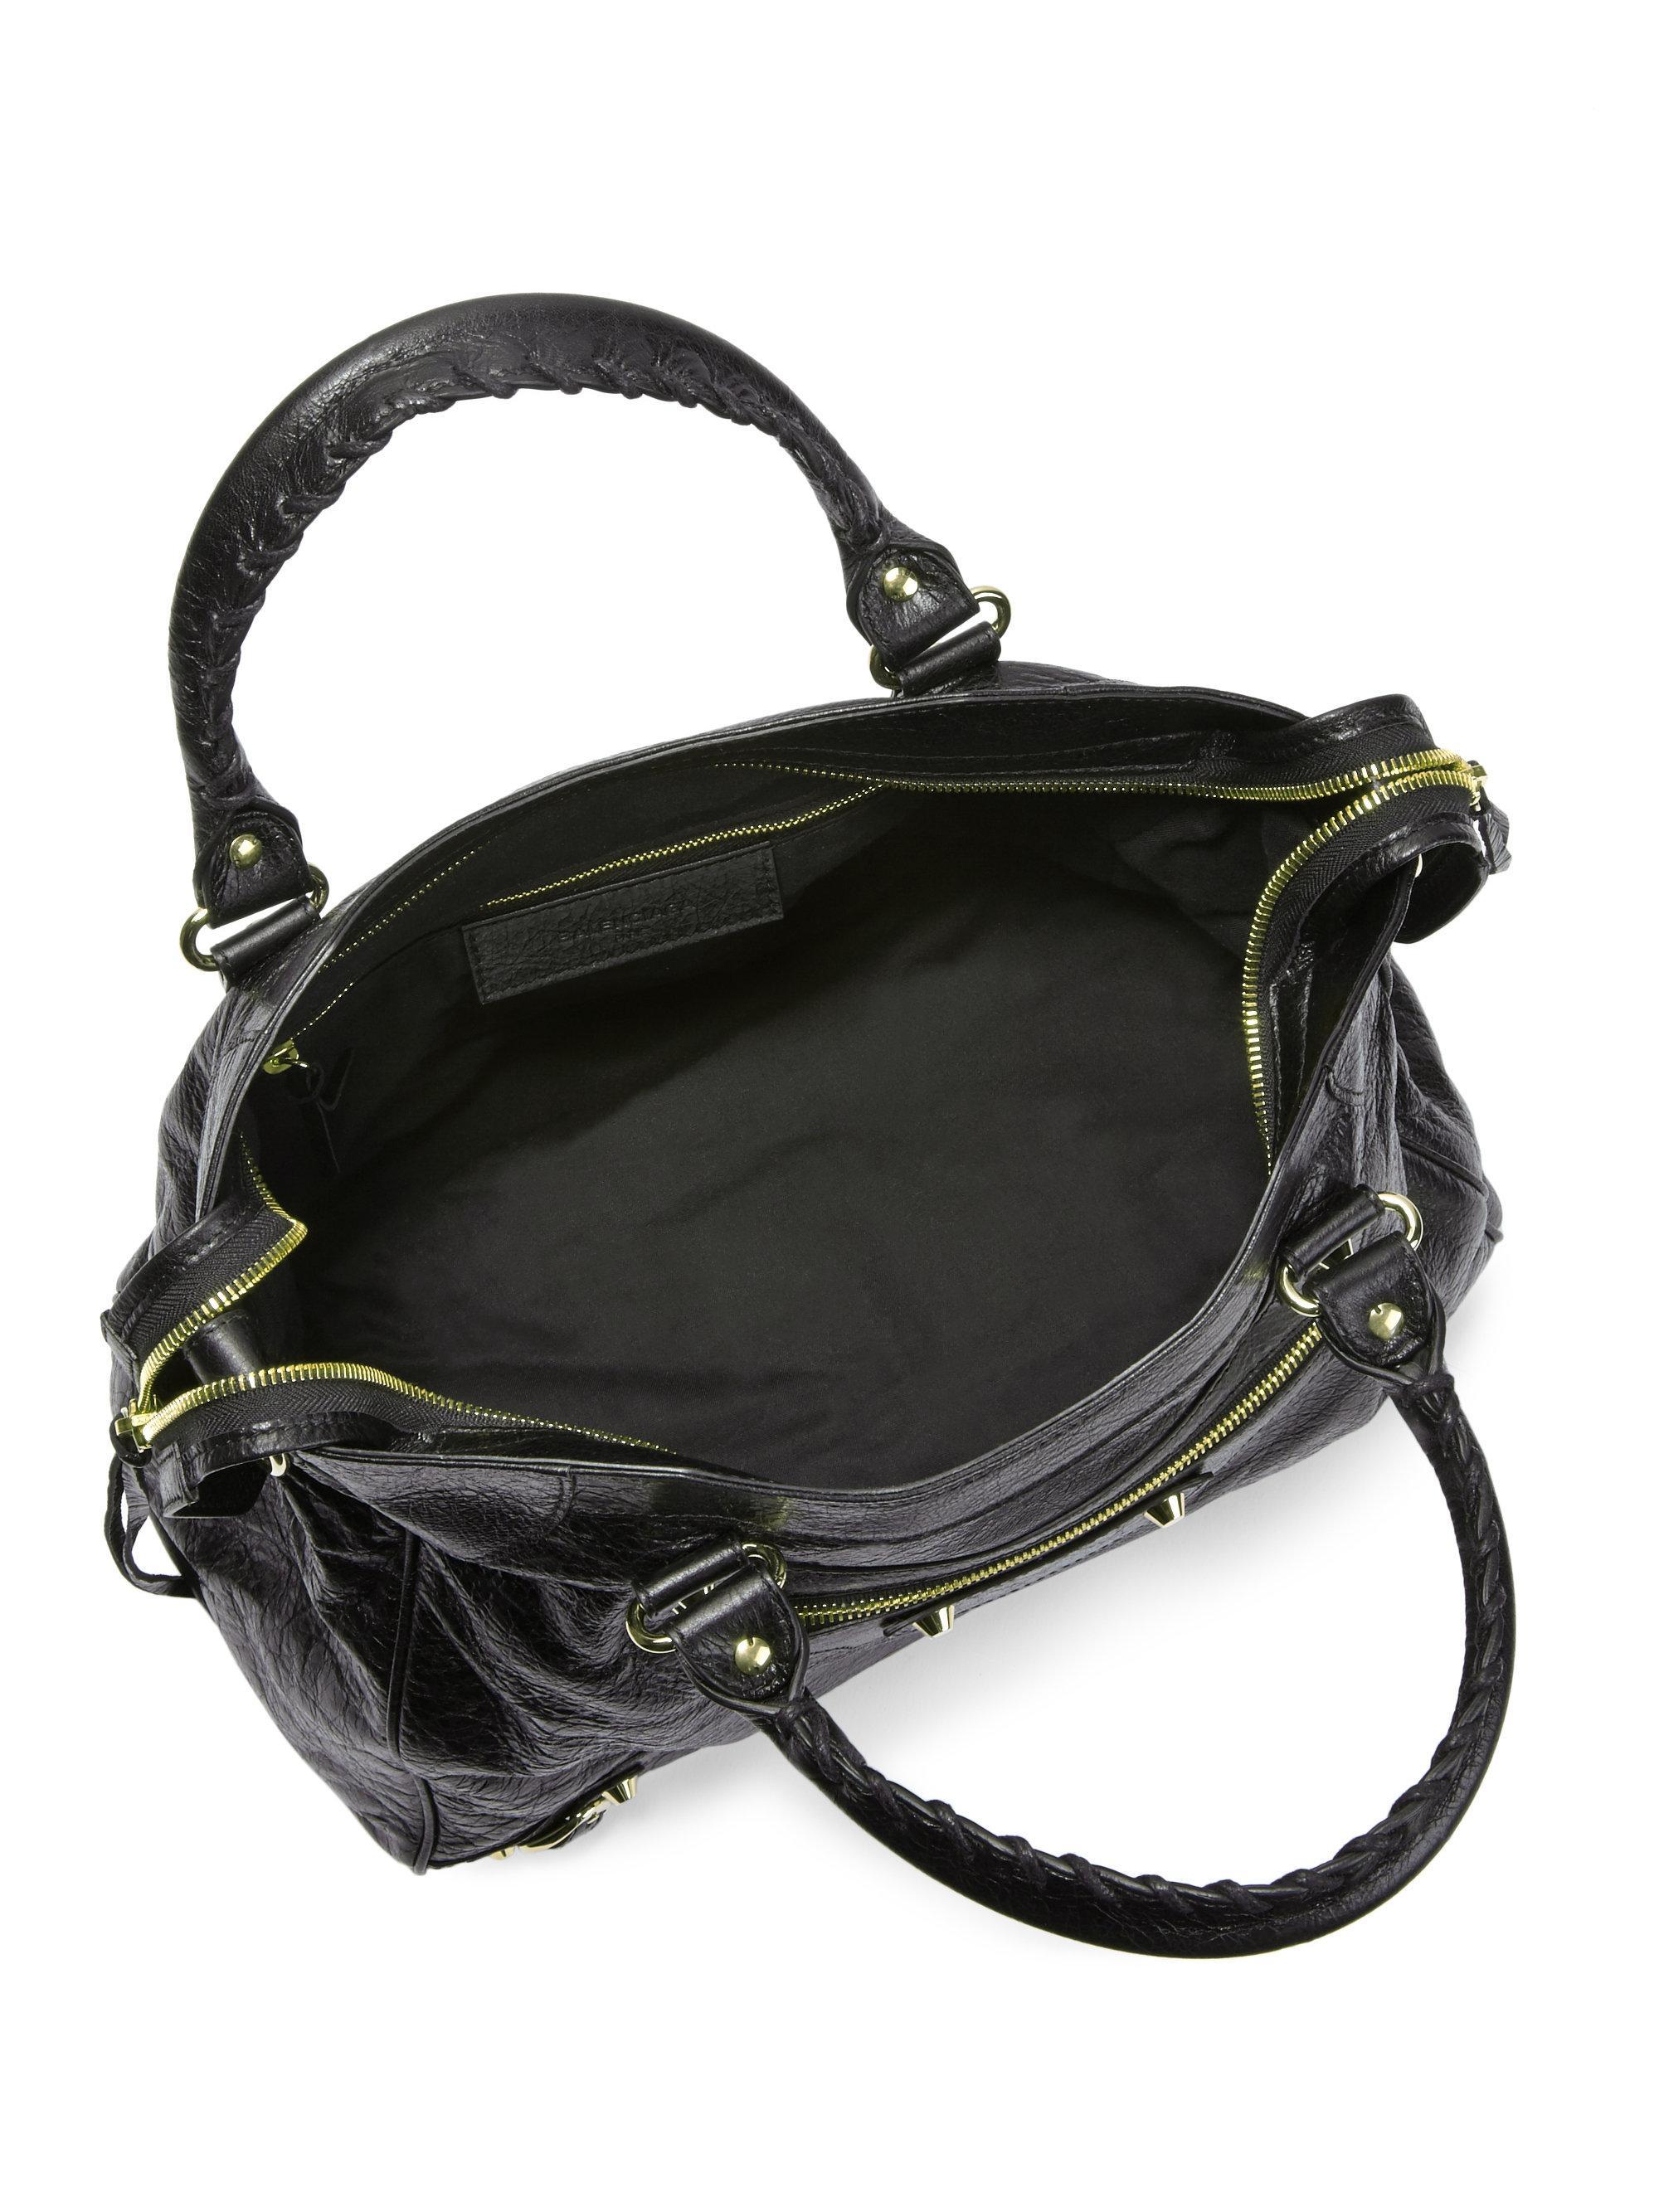 How to Authenticate Balenciaga Bags   Lollipuff